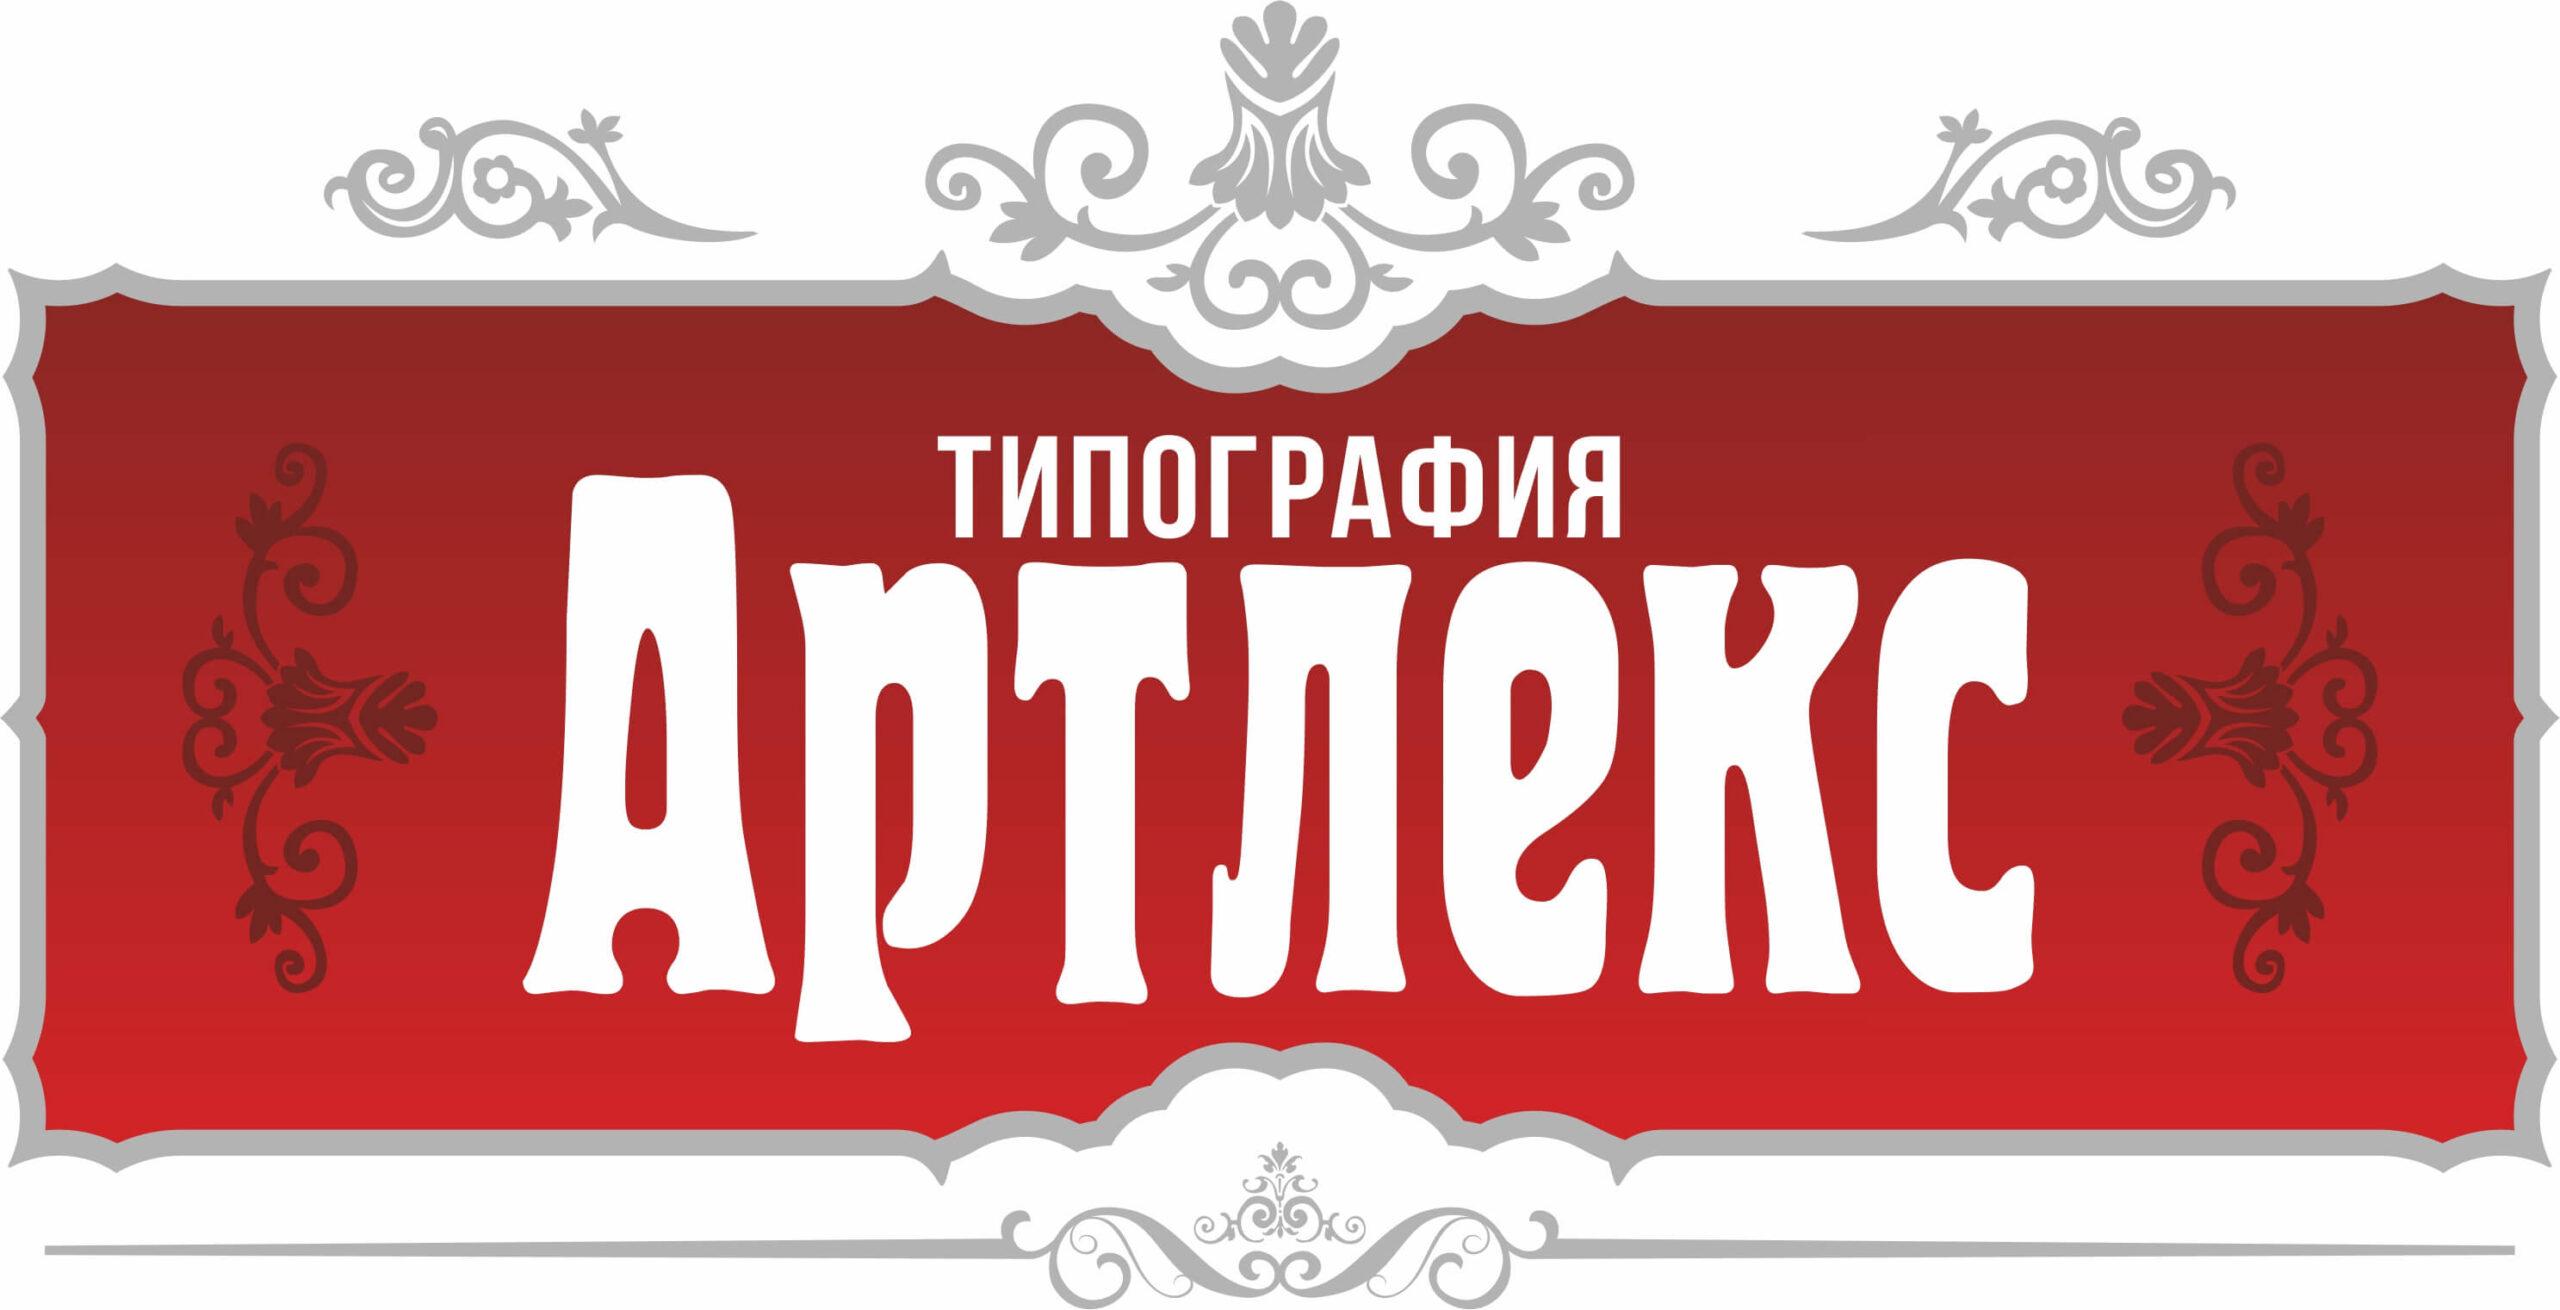 Типография Артлекс